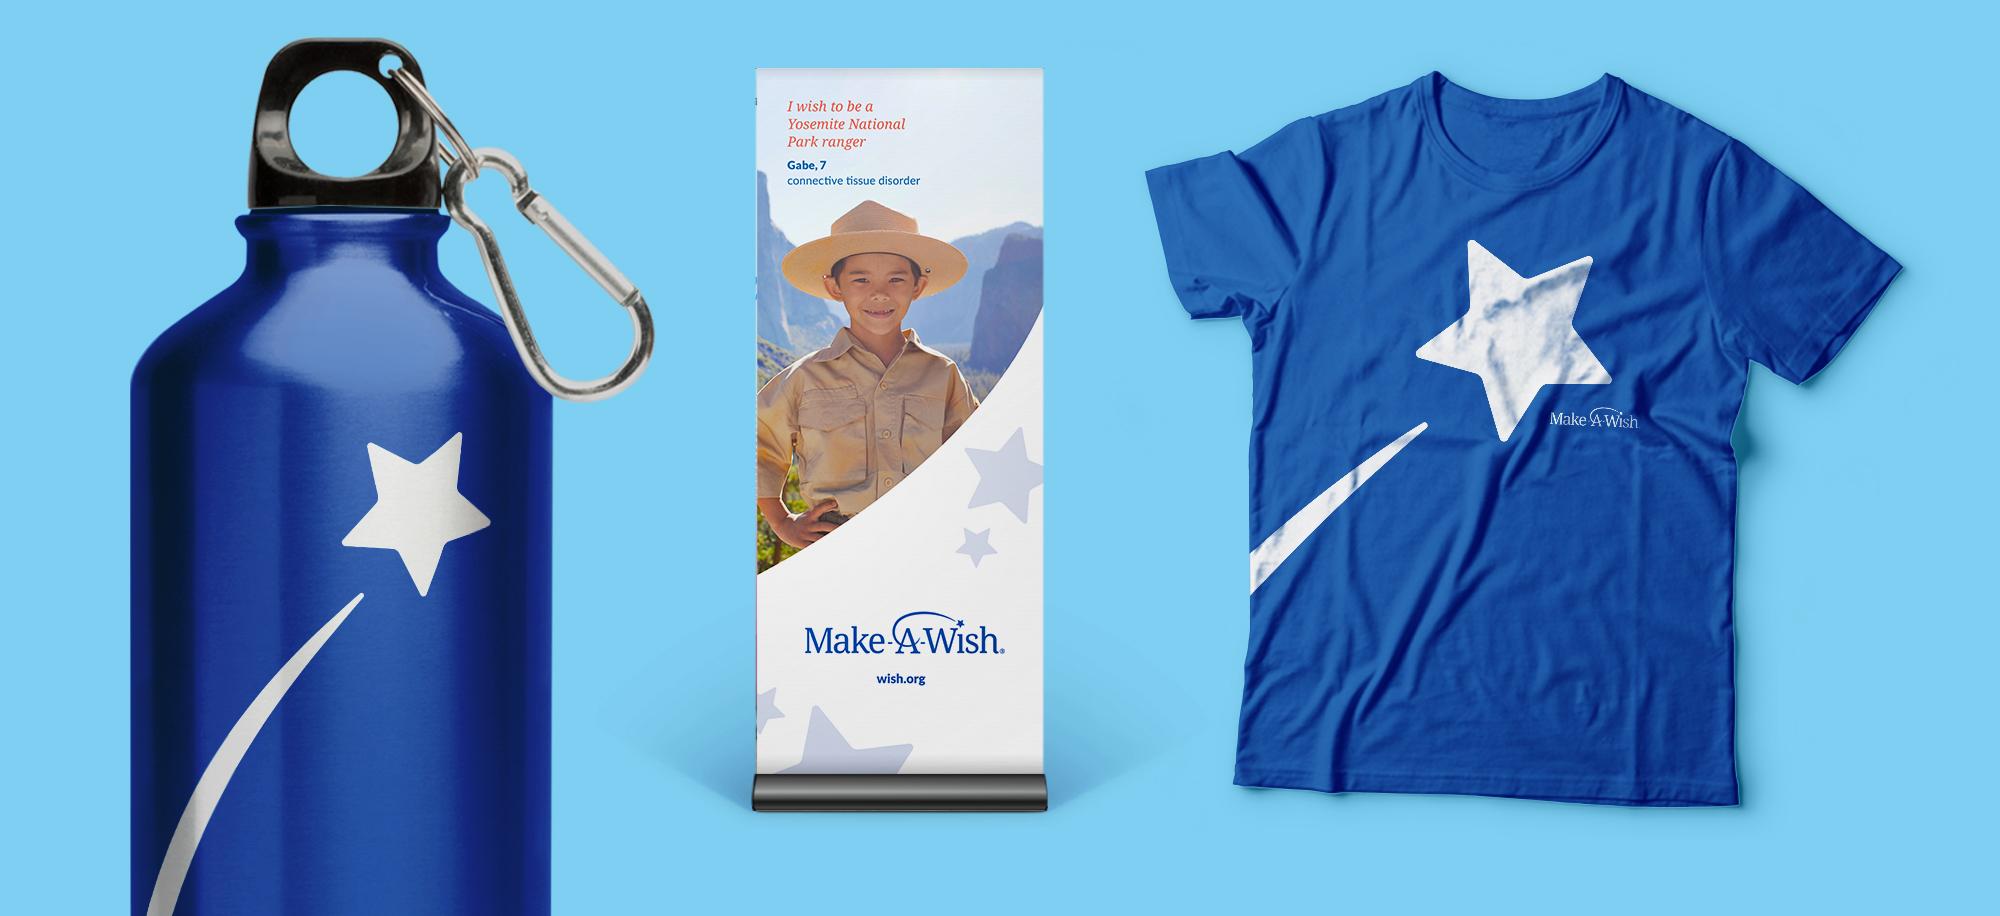 Make-a-Wish Stand up Banner Design